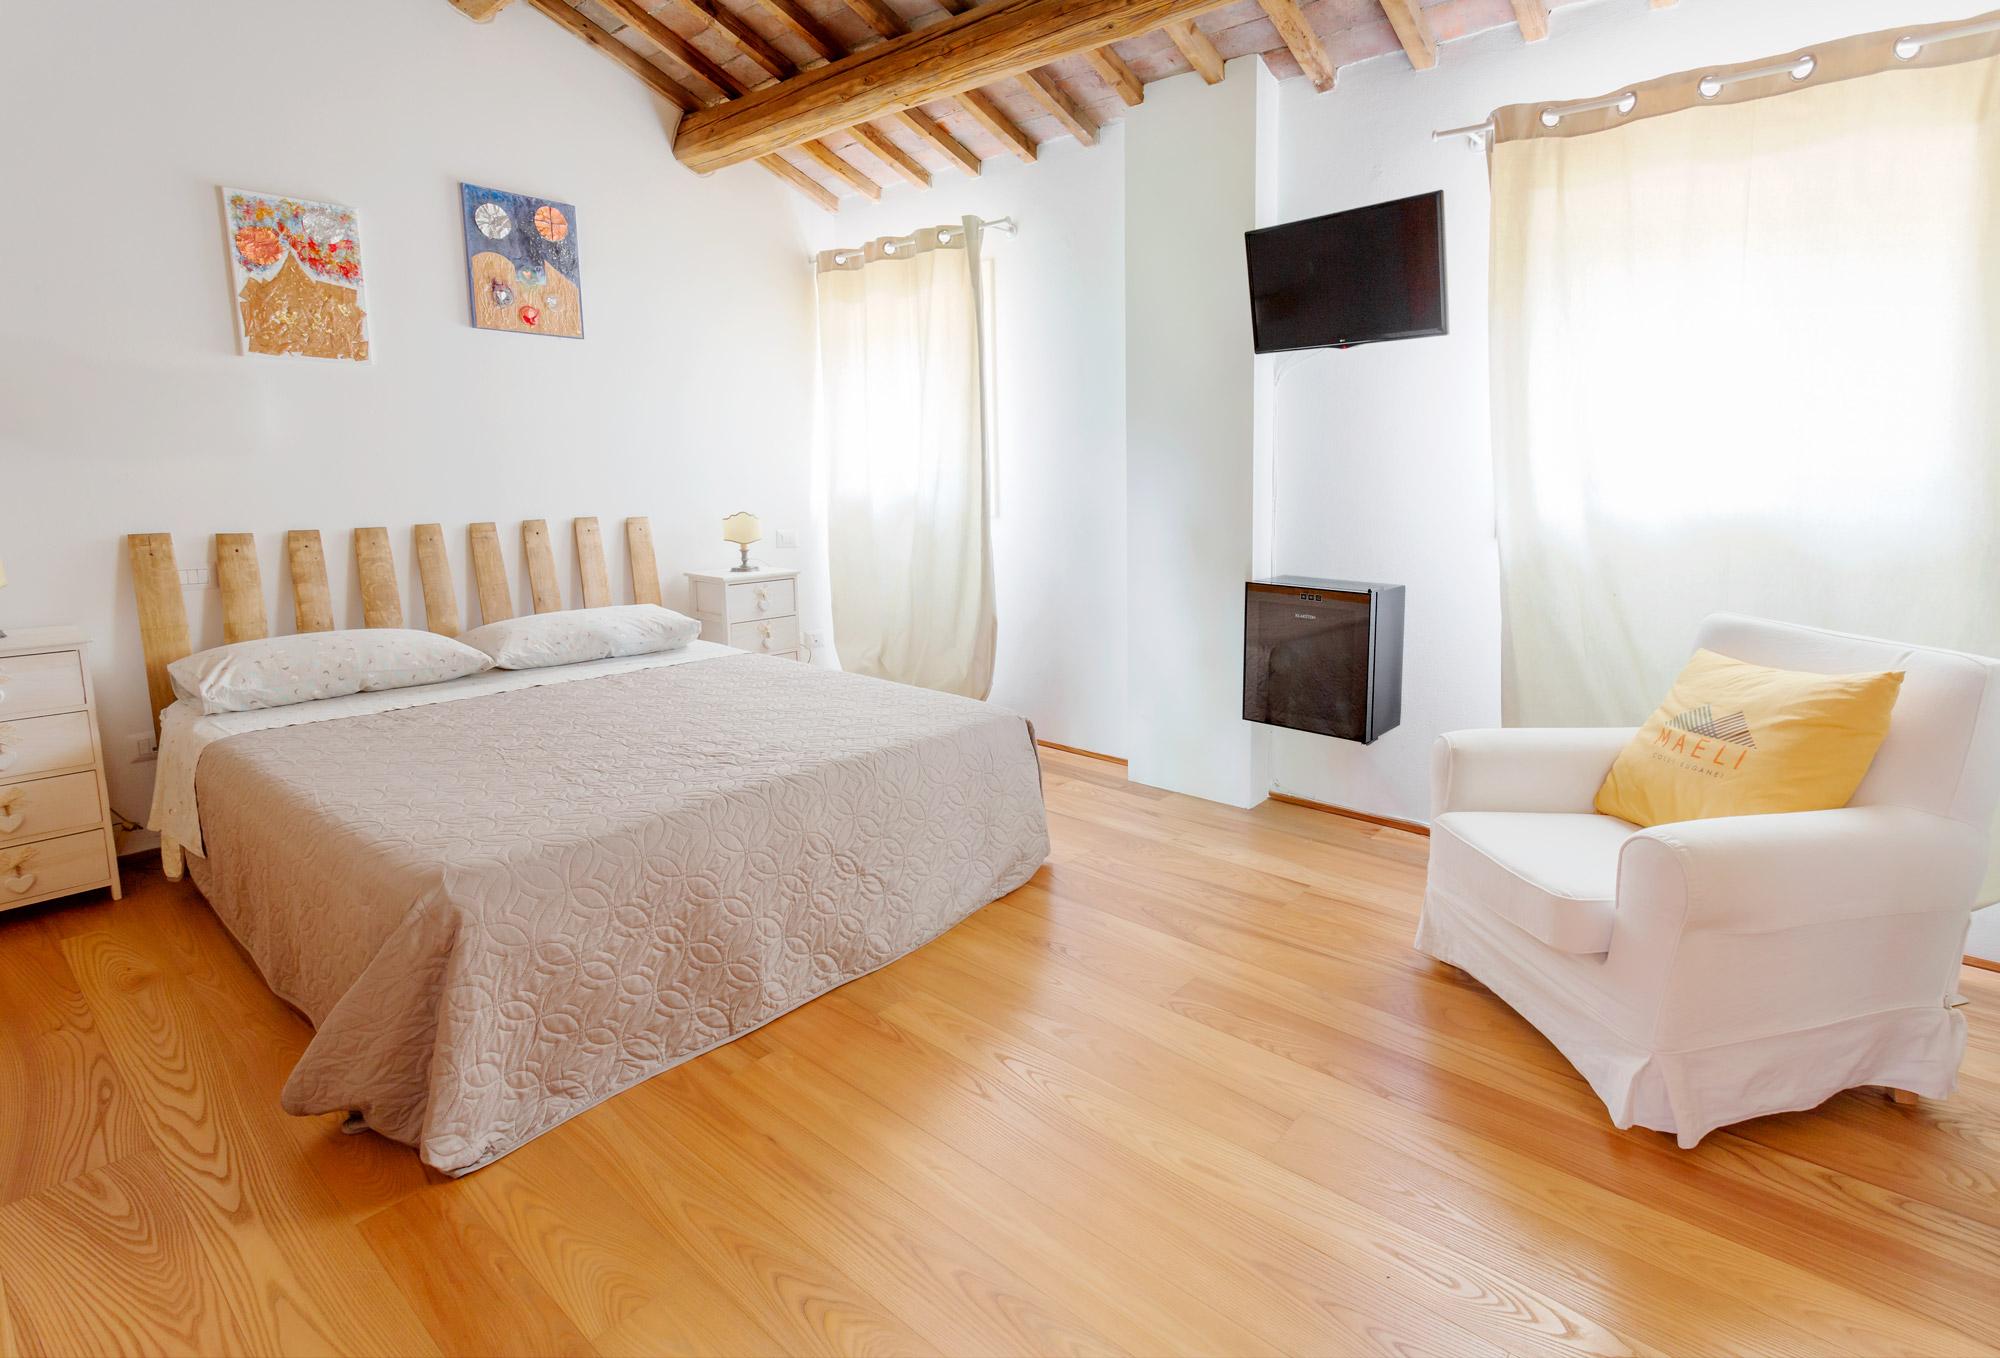 Maeli - Ritratti, paesaggi e stanze - 06-2019 - 131.jpg